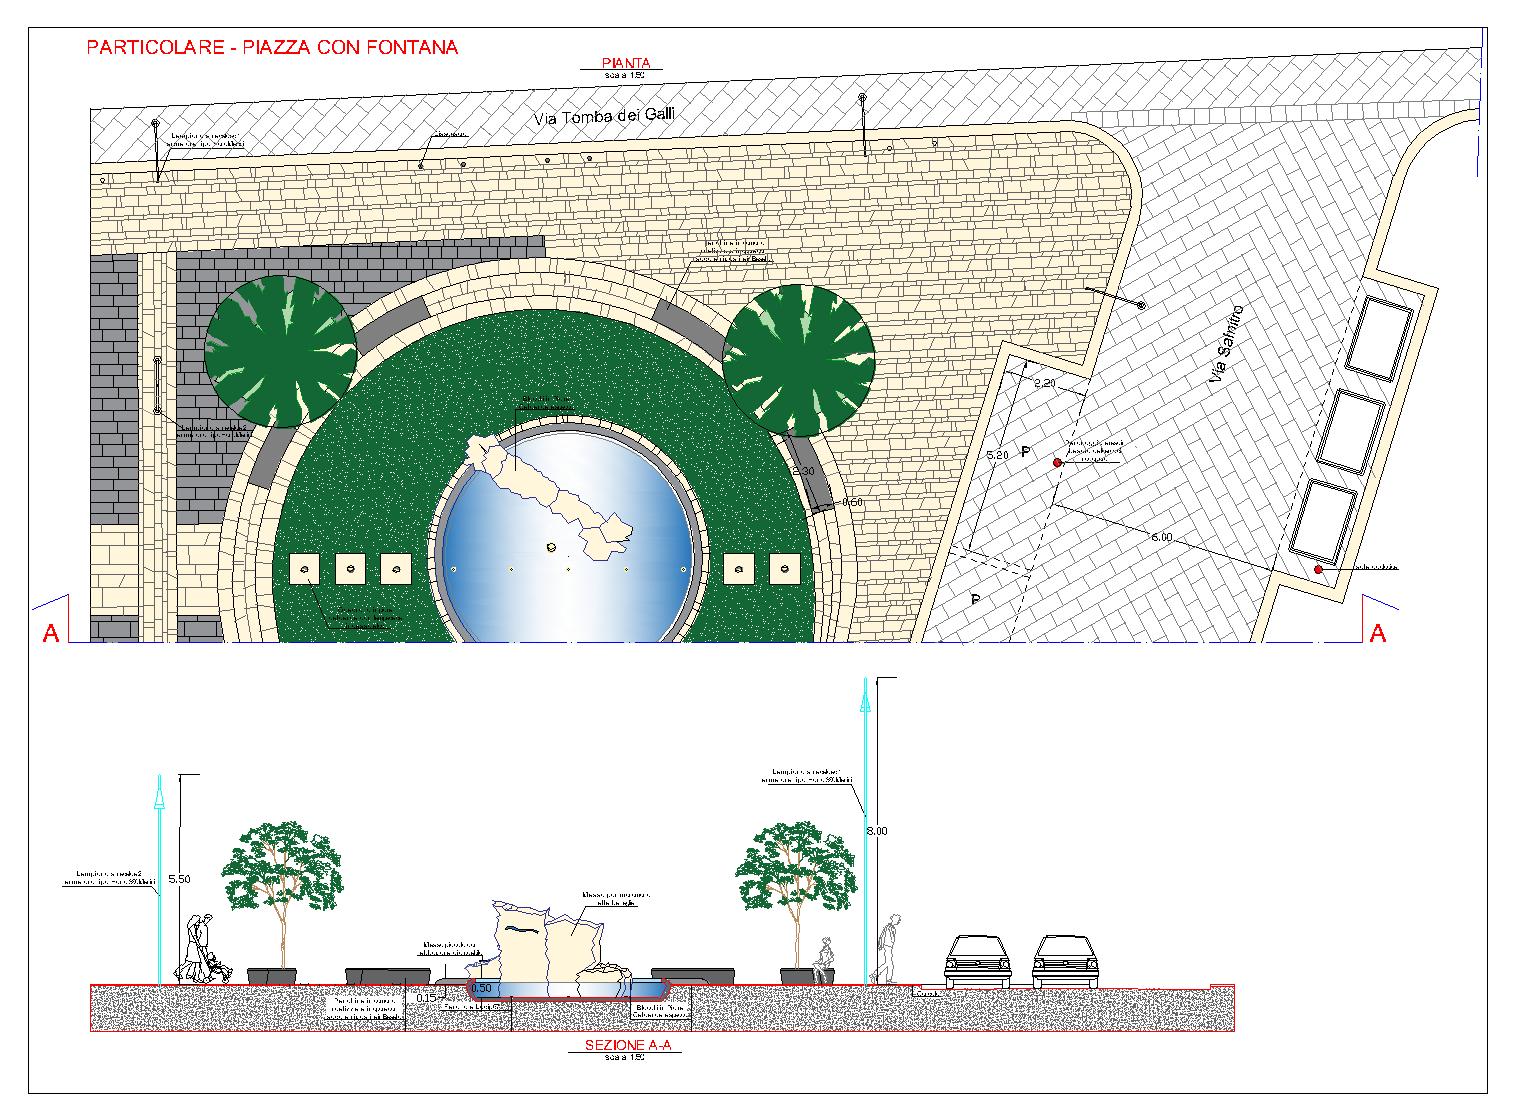 Tav. Part.Piazza con fontana Ex Cabina Enel-Model